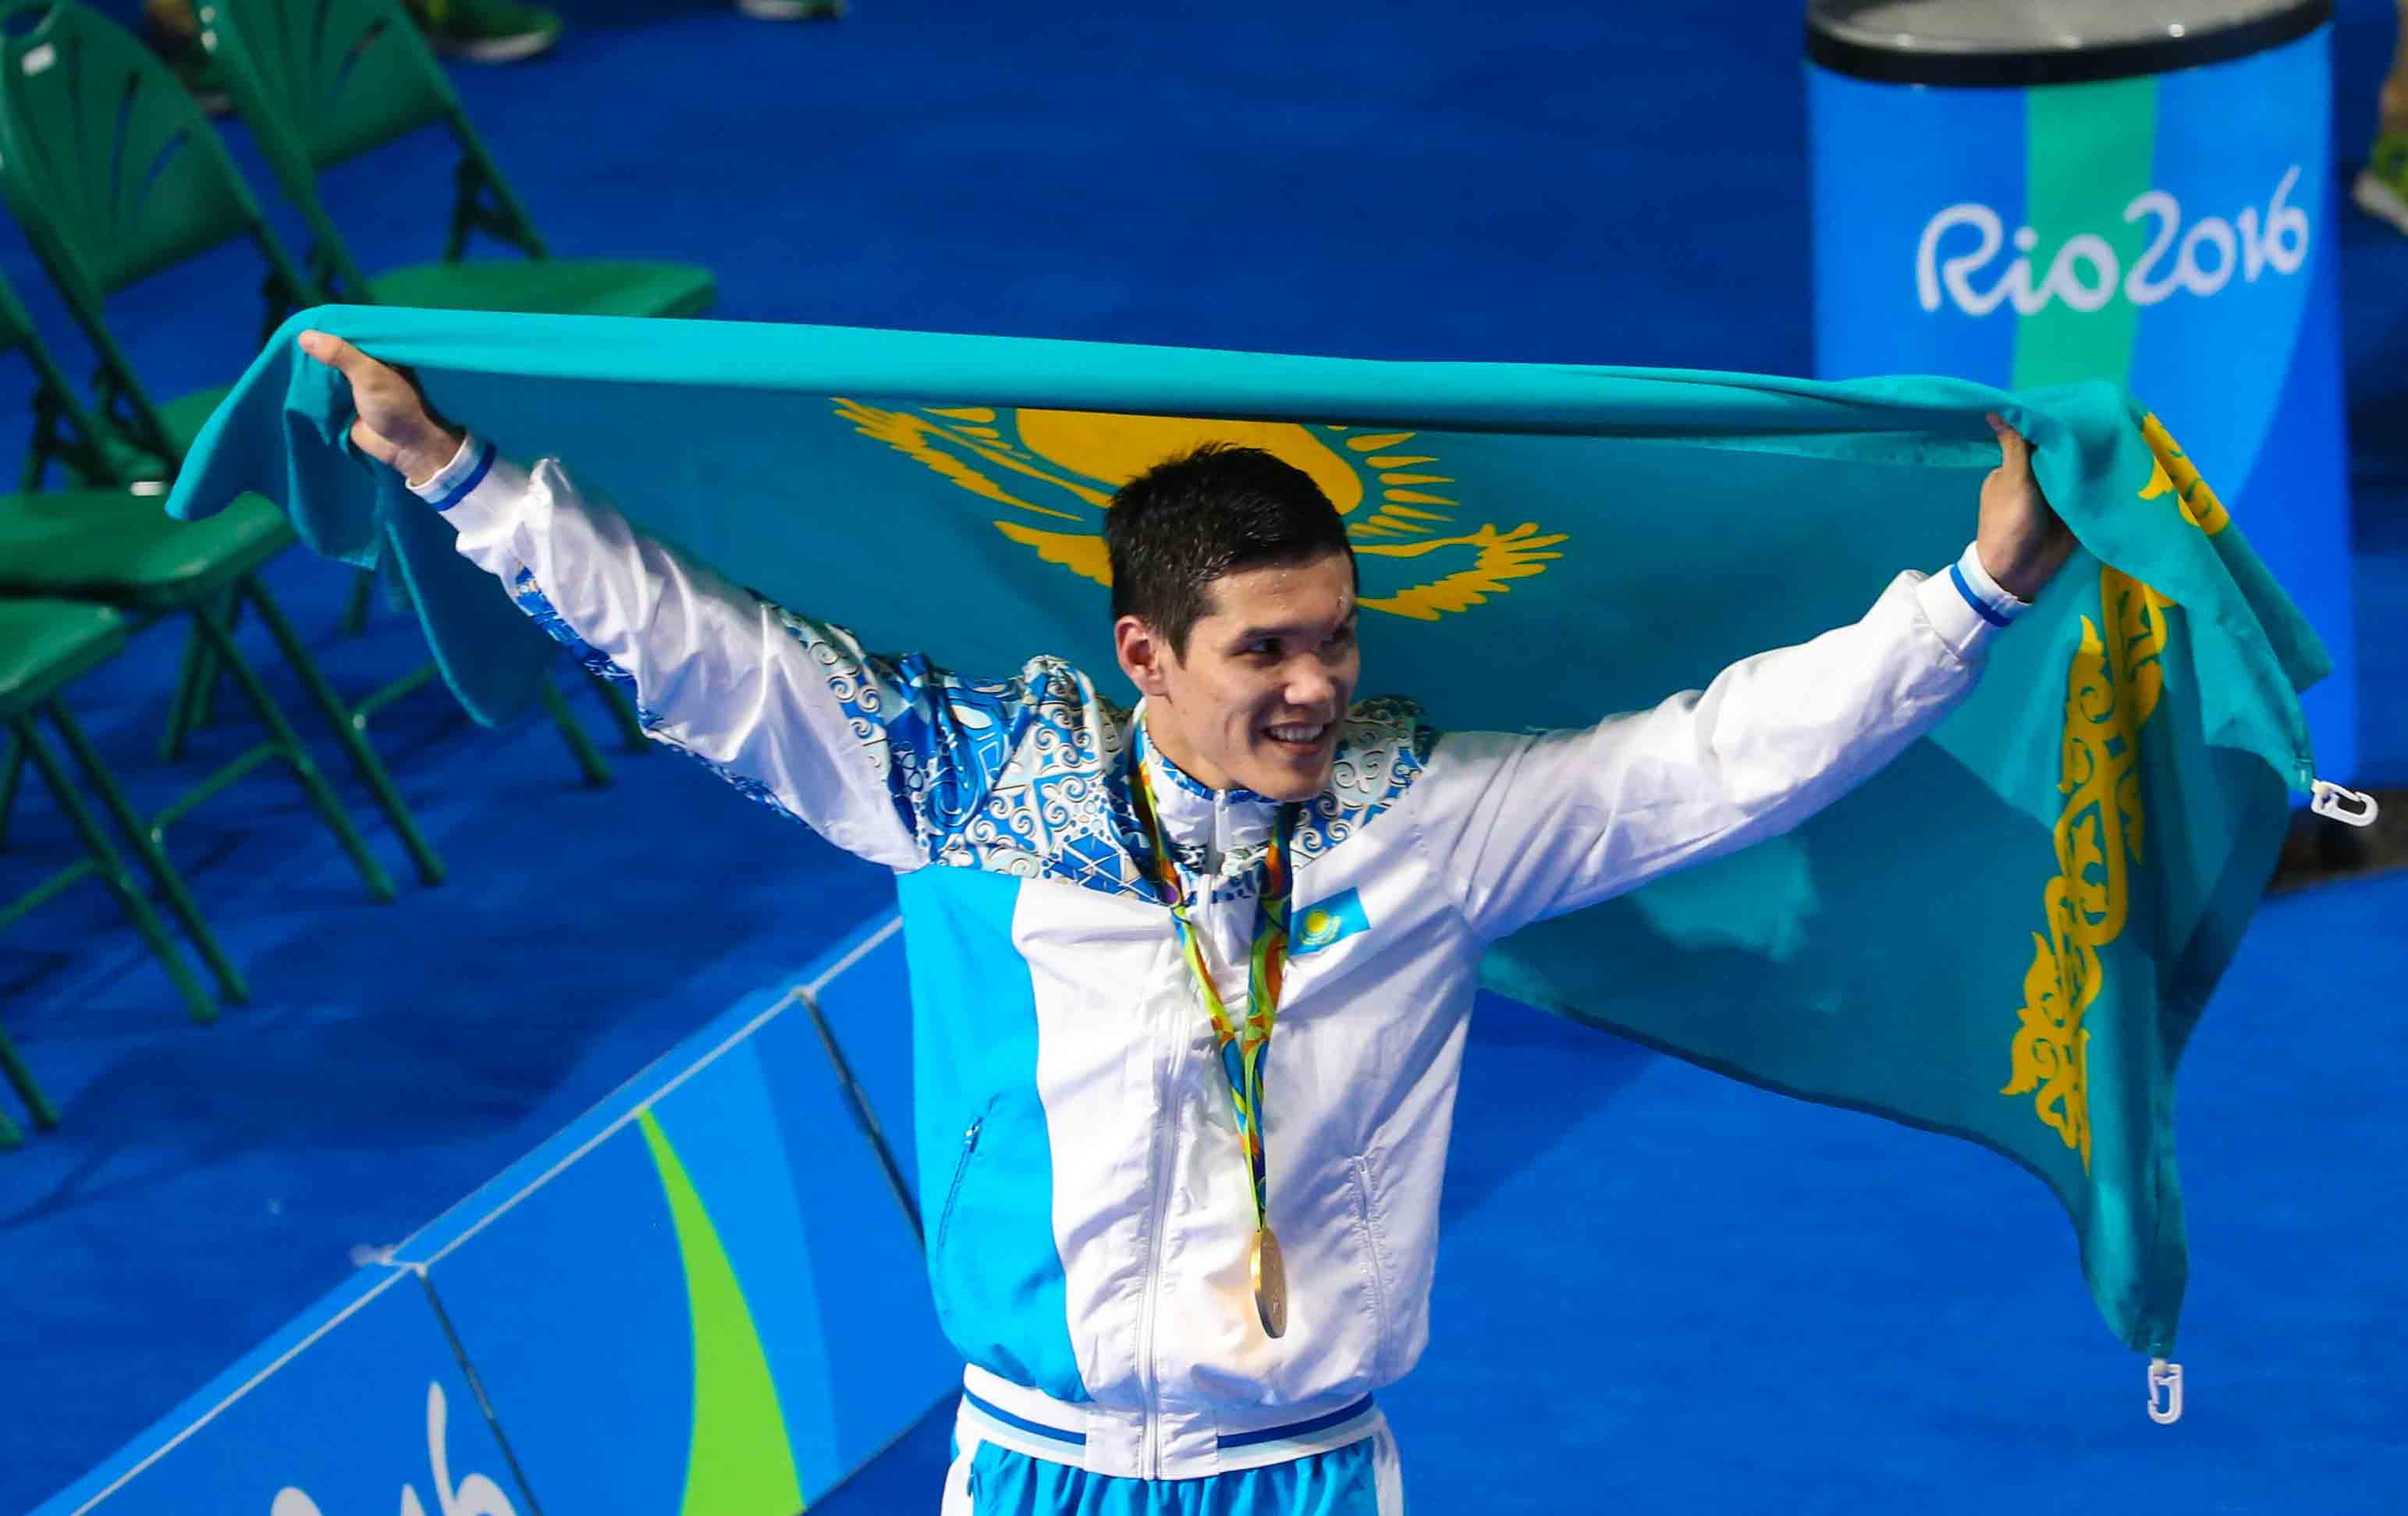 считаете, олимпиада картинки казахстана ваша нормальная